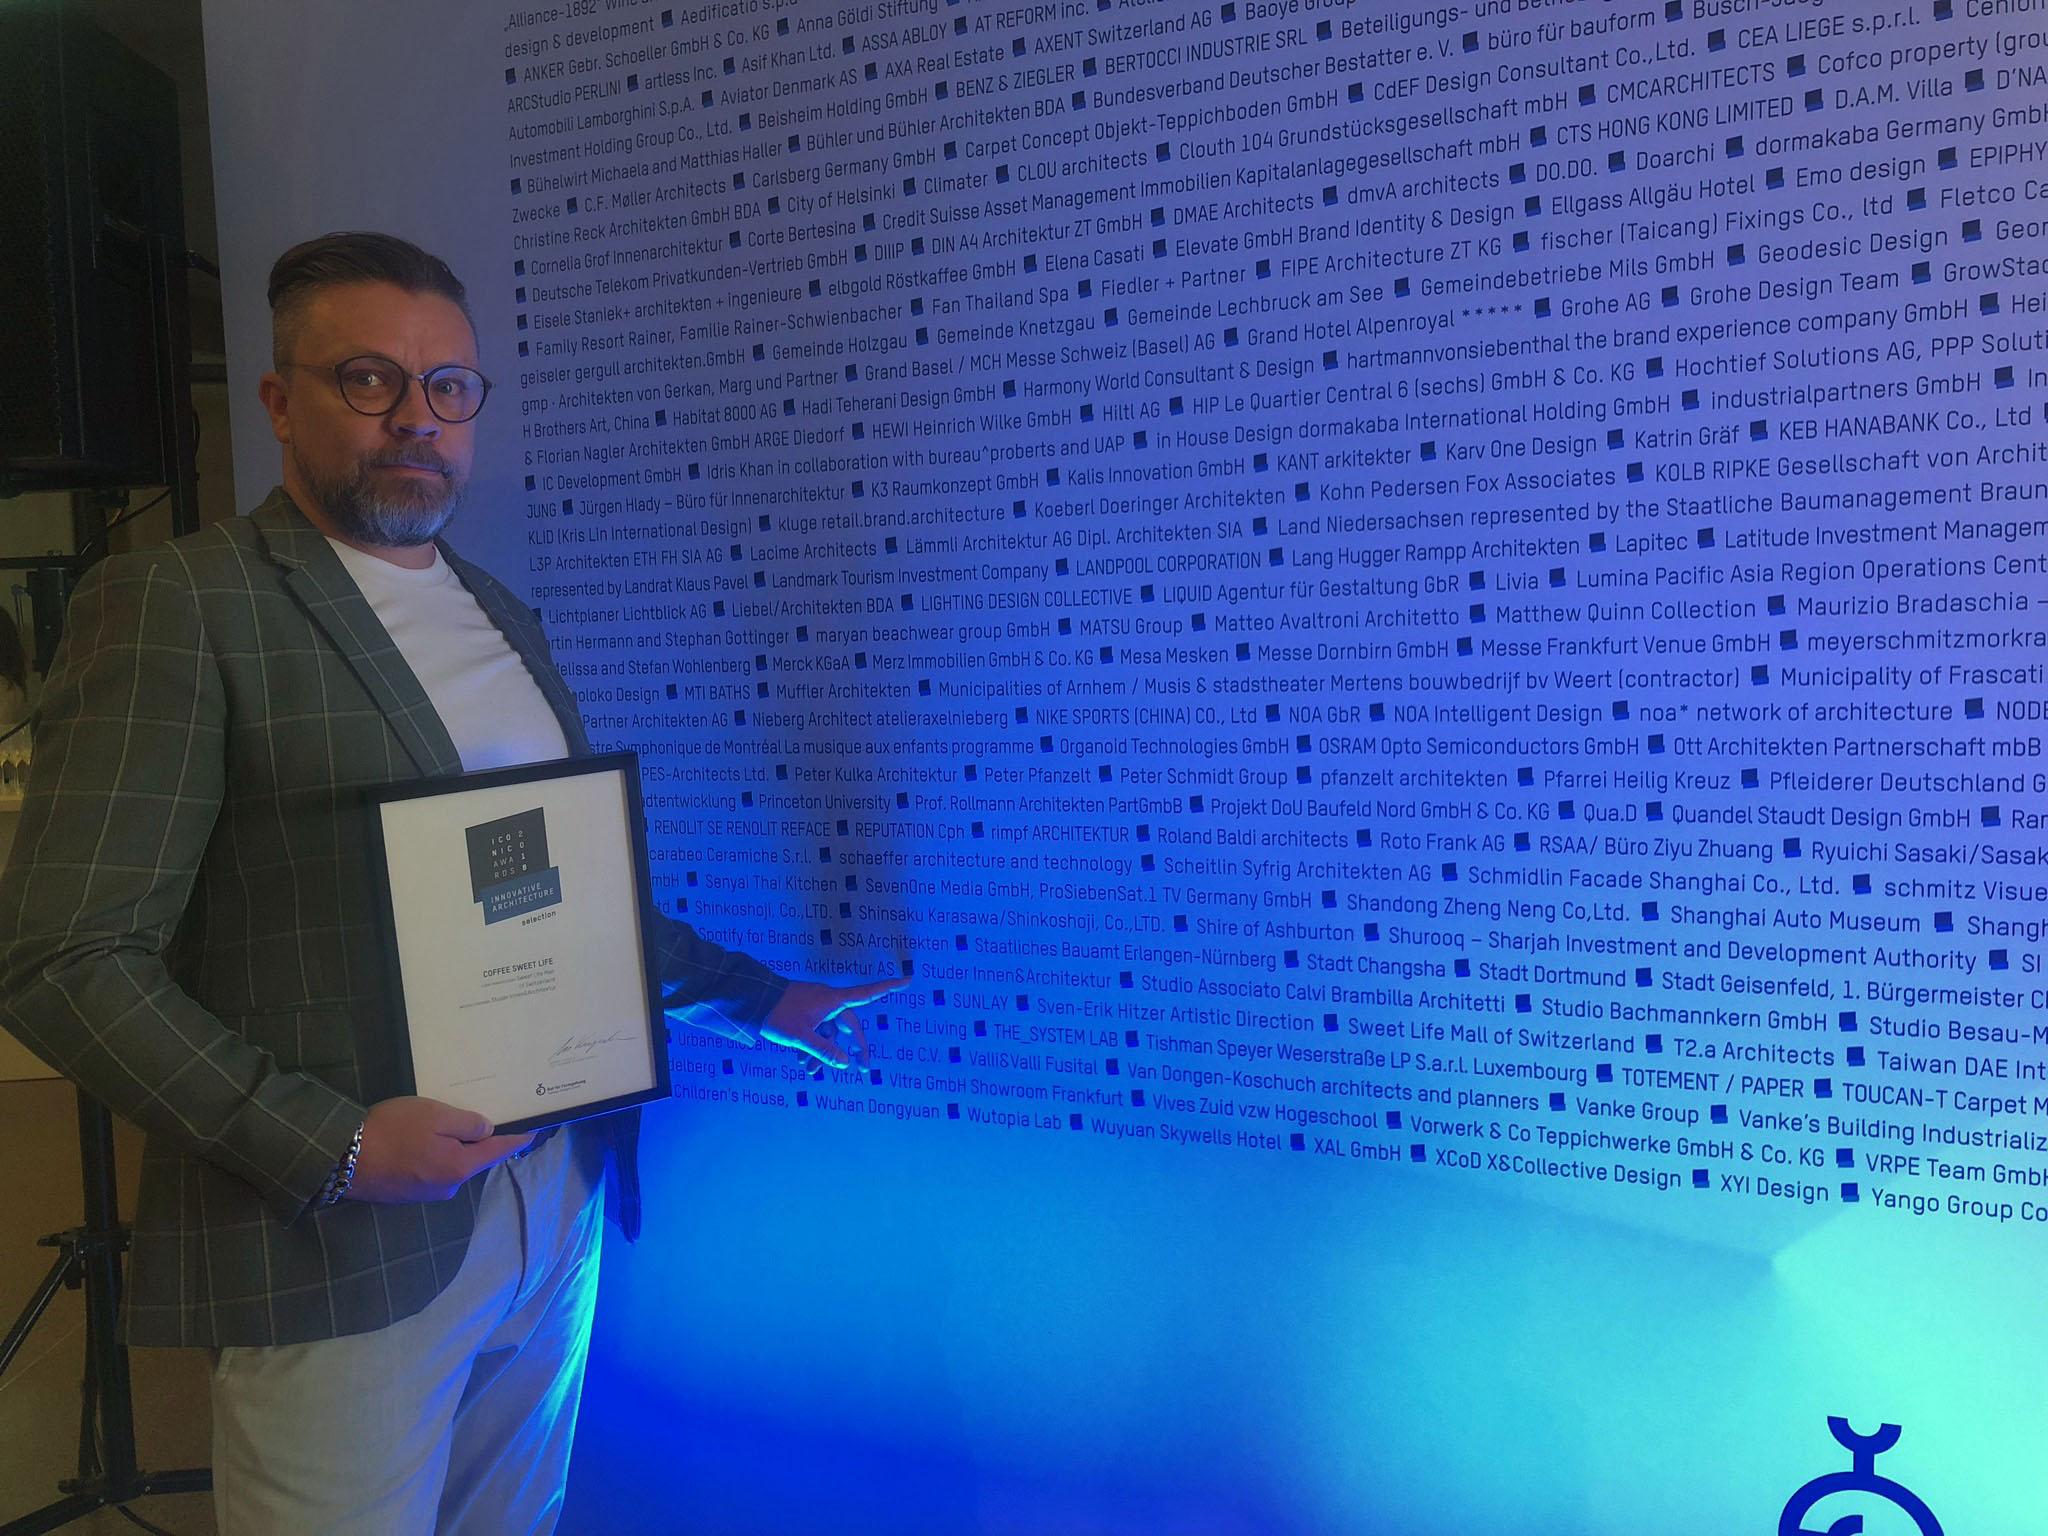 ICONIC AWARD 2018 Architektur Florian Studer.jpg